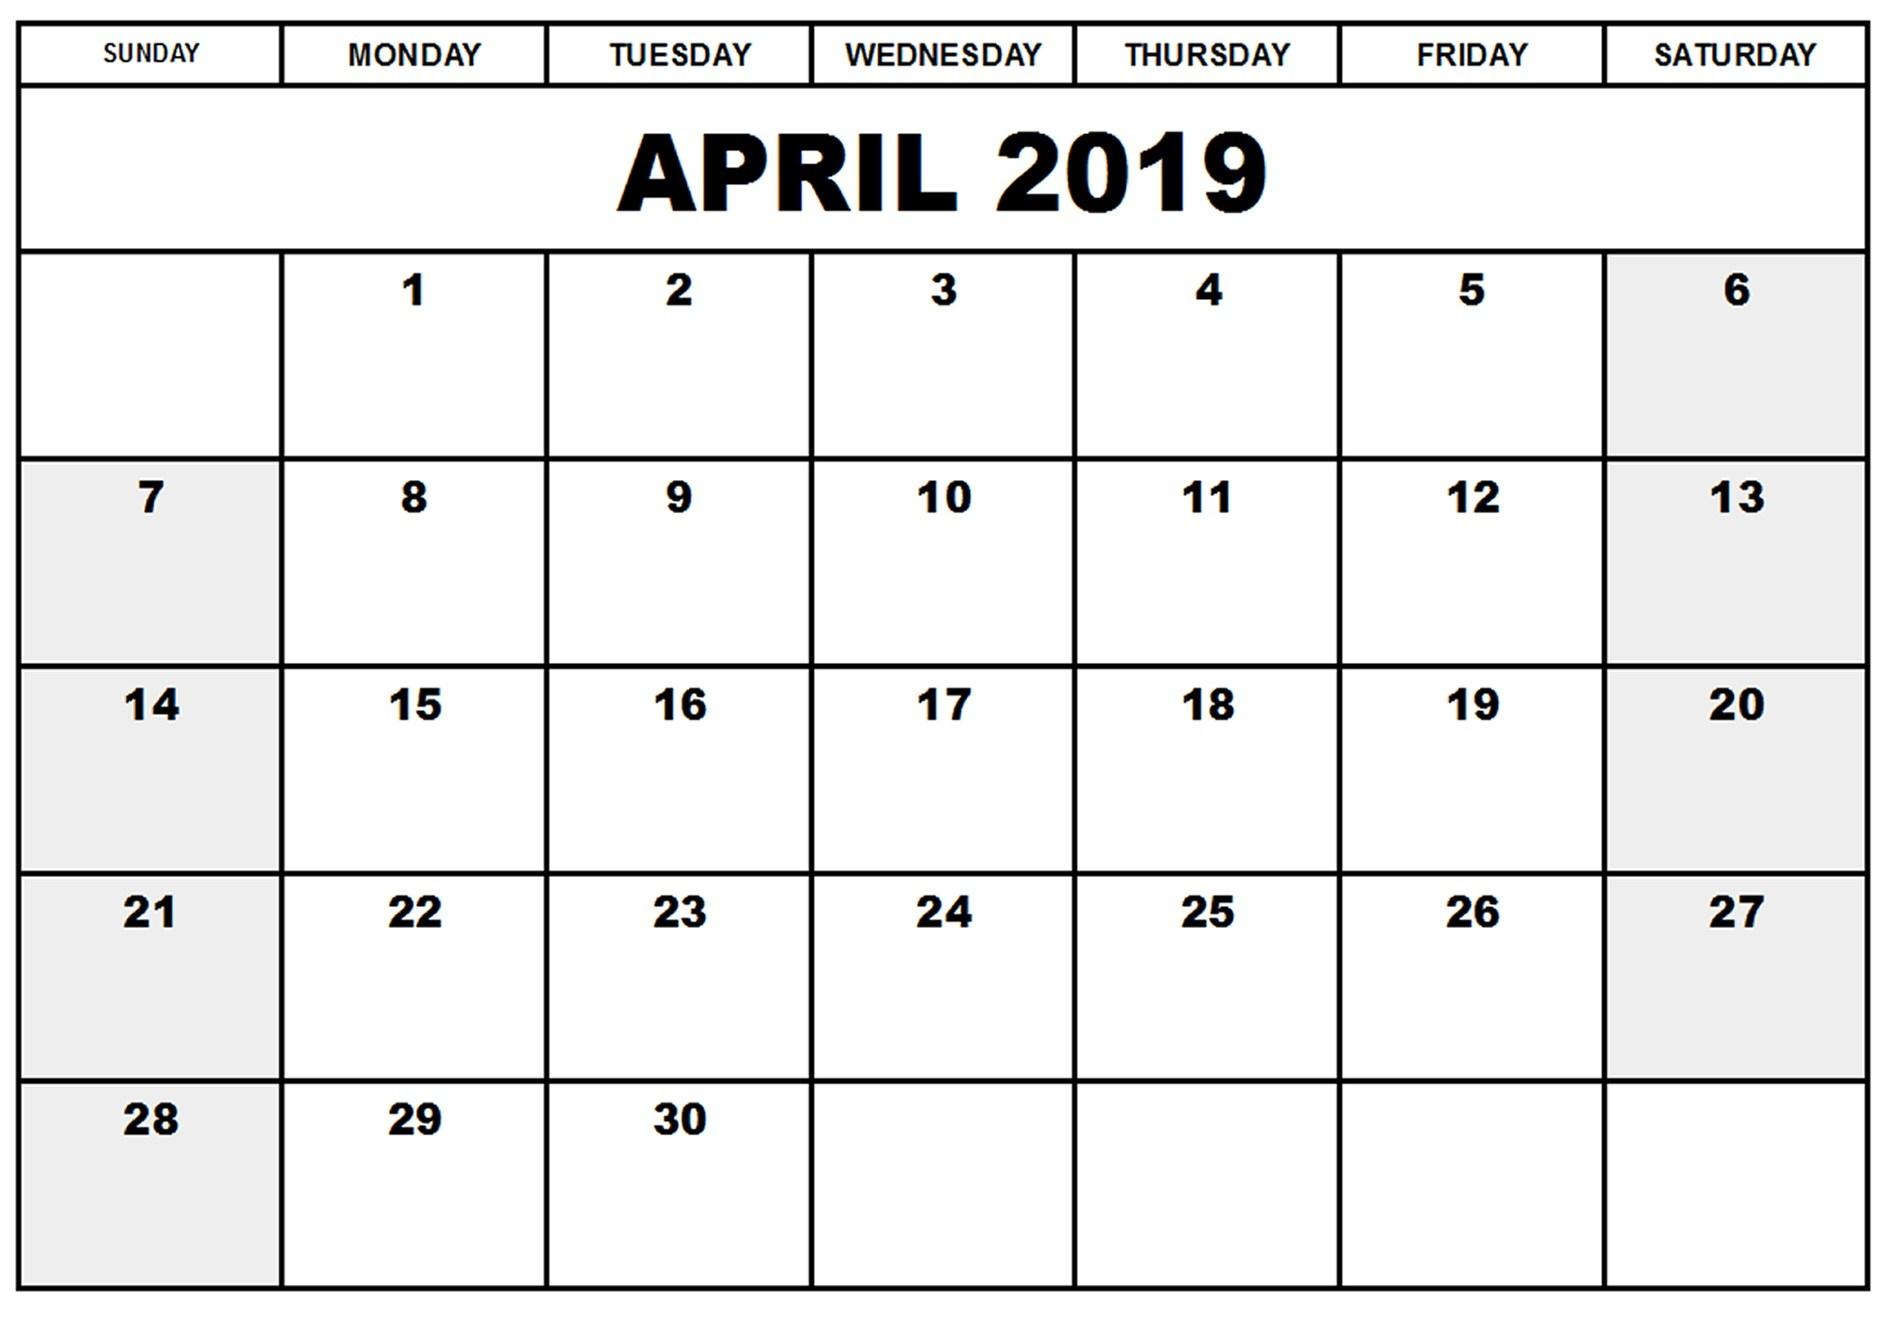 April 2019 Printable Calendar Templates - Free Blank, Holidays regarding Free Blank Calendar Sheets